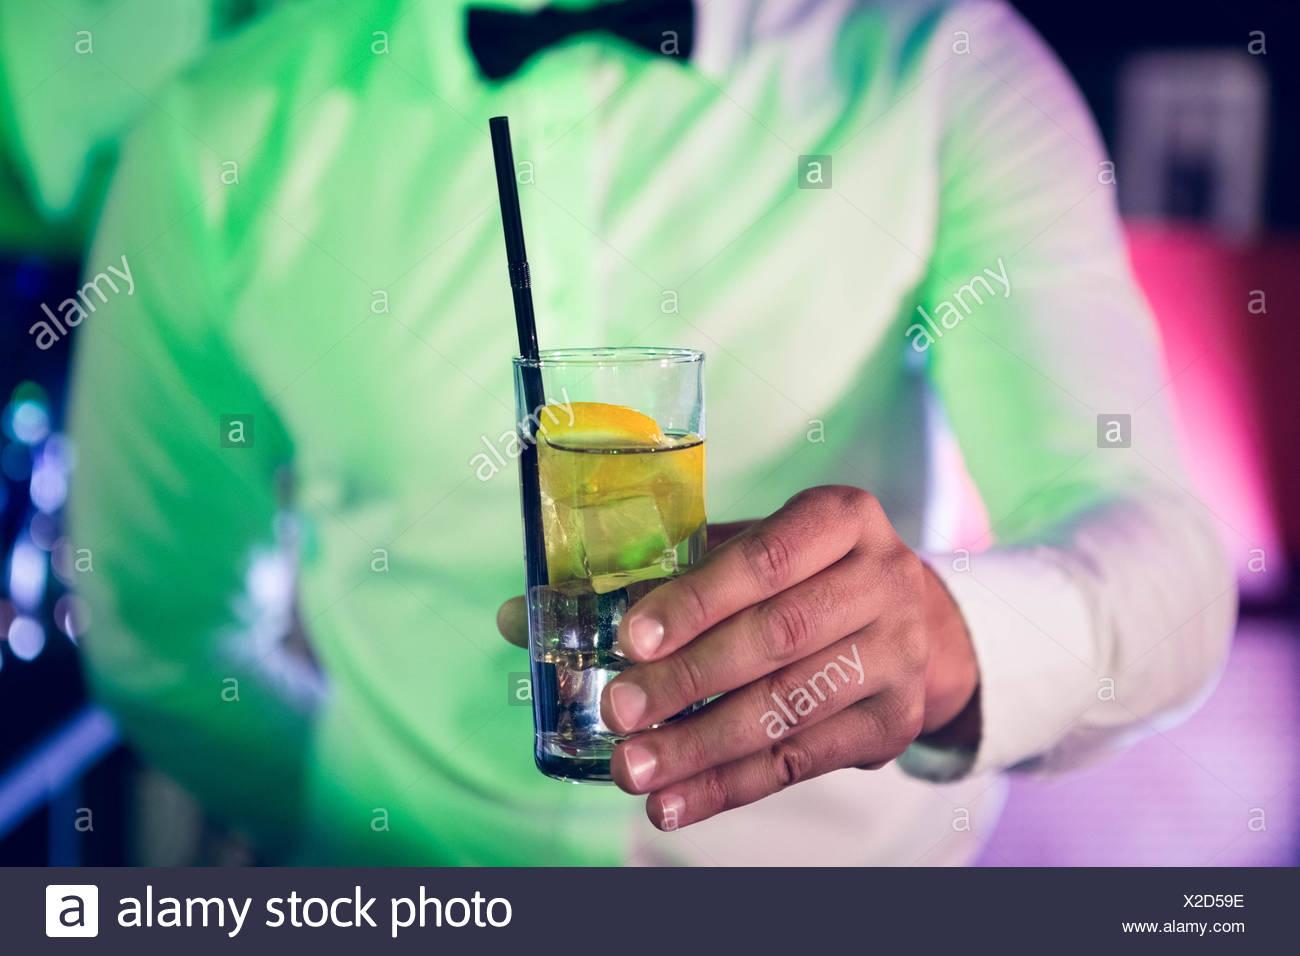 Bartender serving glass of gin - Stock Image